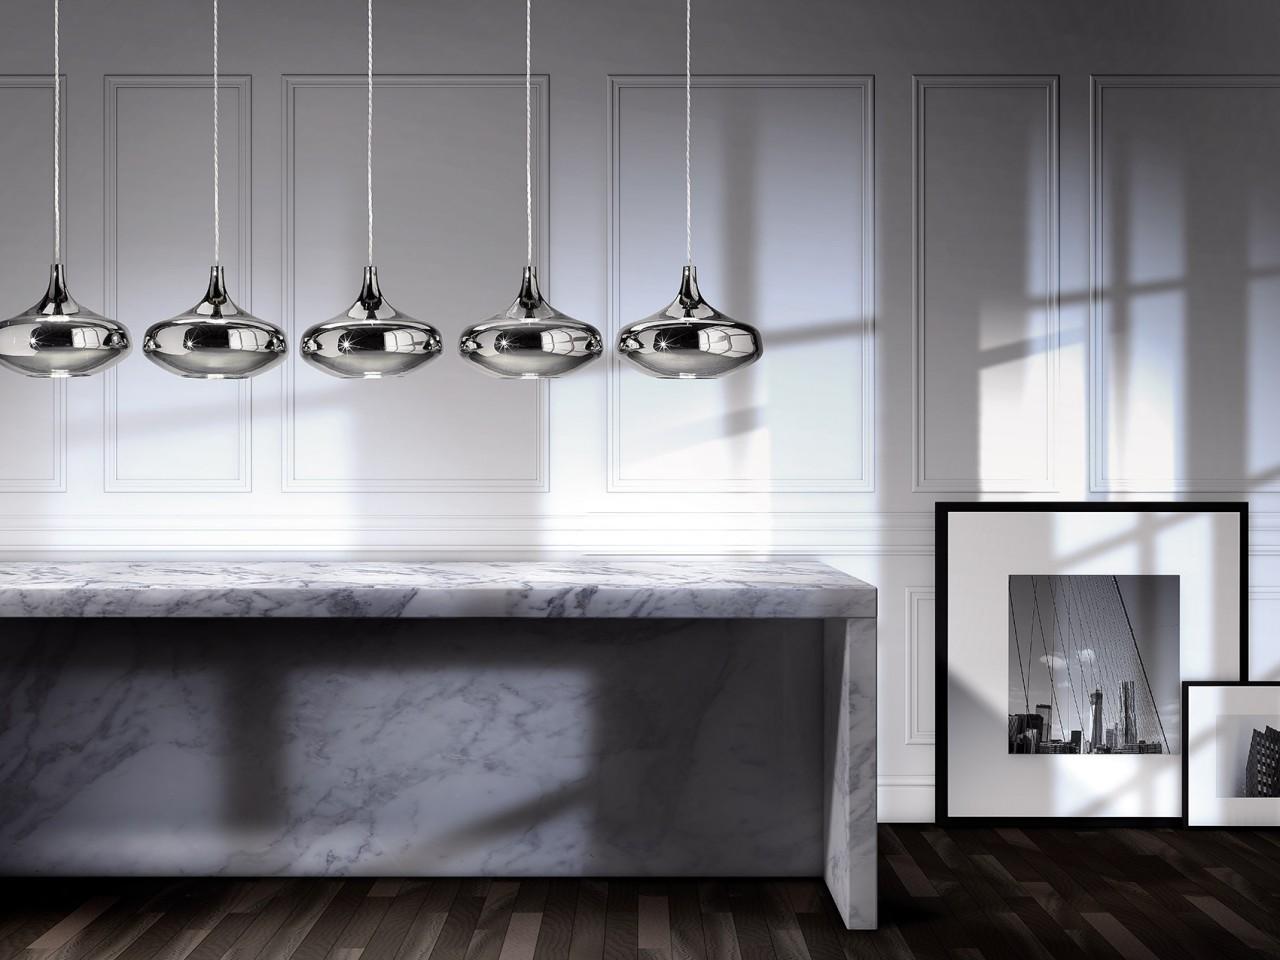 new in 2015 studio italia design. Black Bedroom Furniture Sets. Home Design Ideas